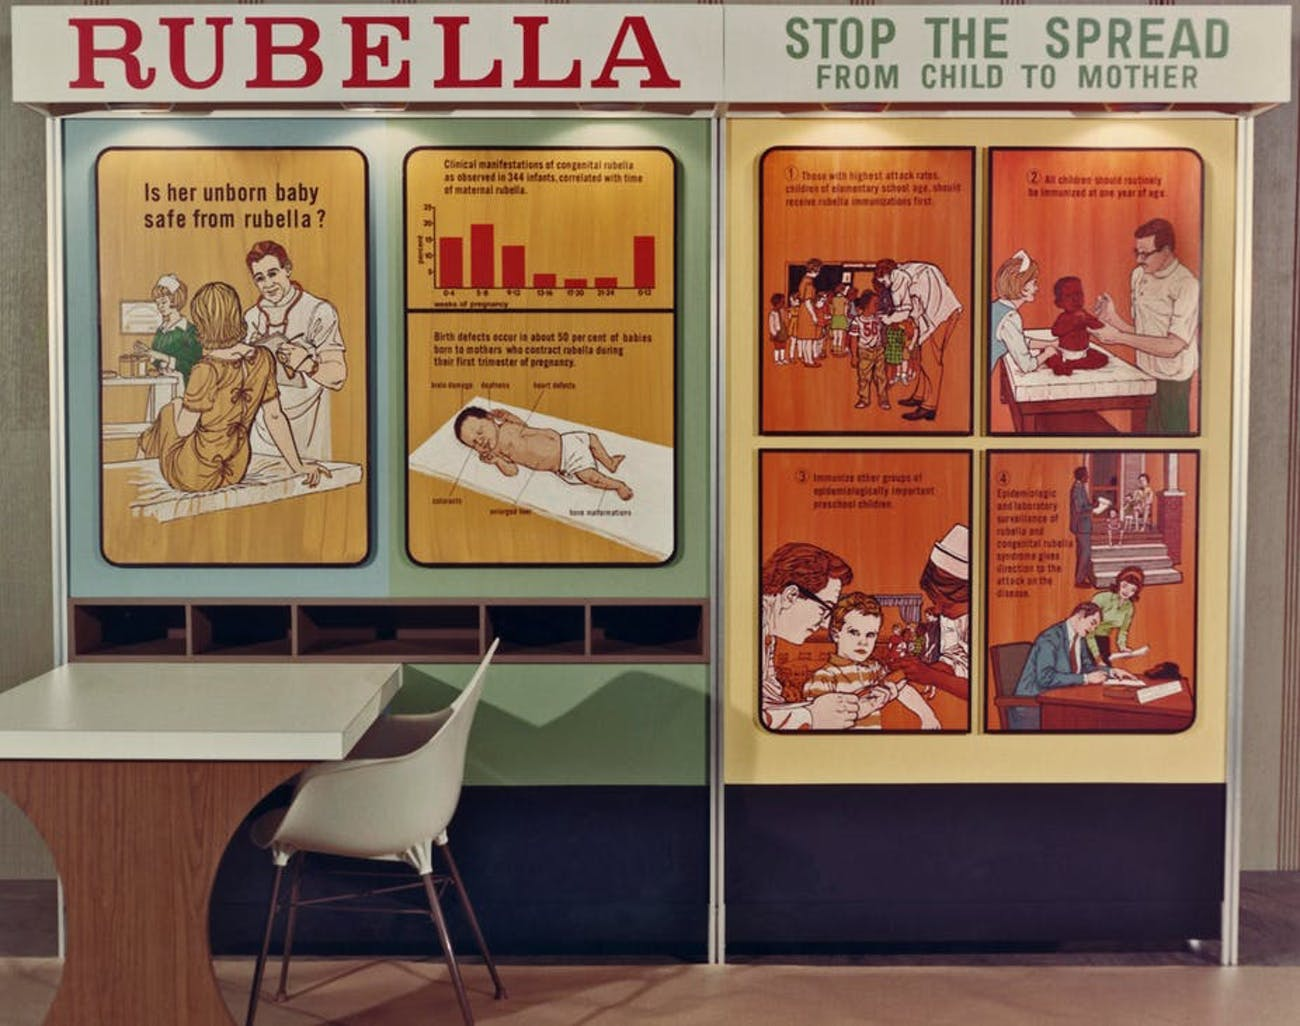 public health campaigns